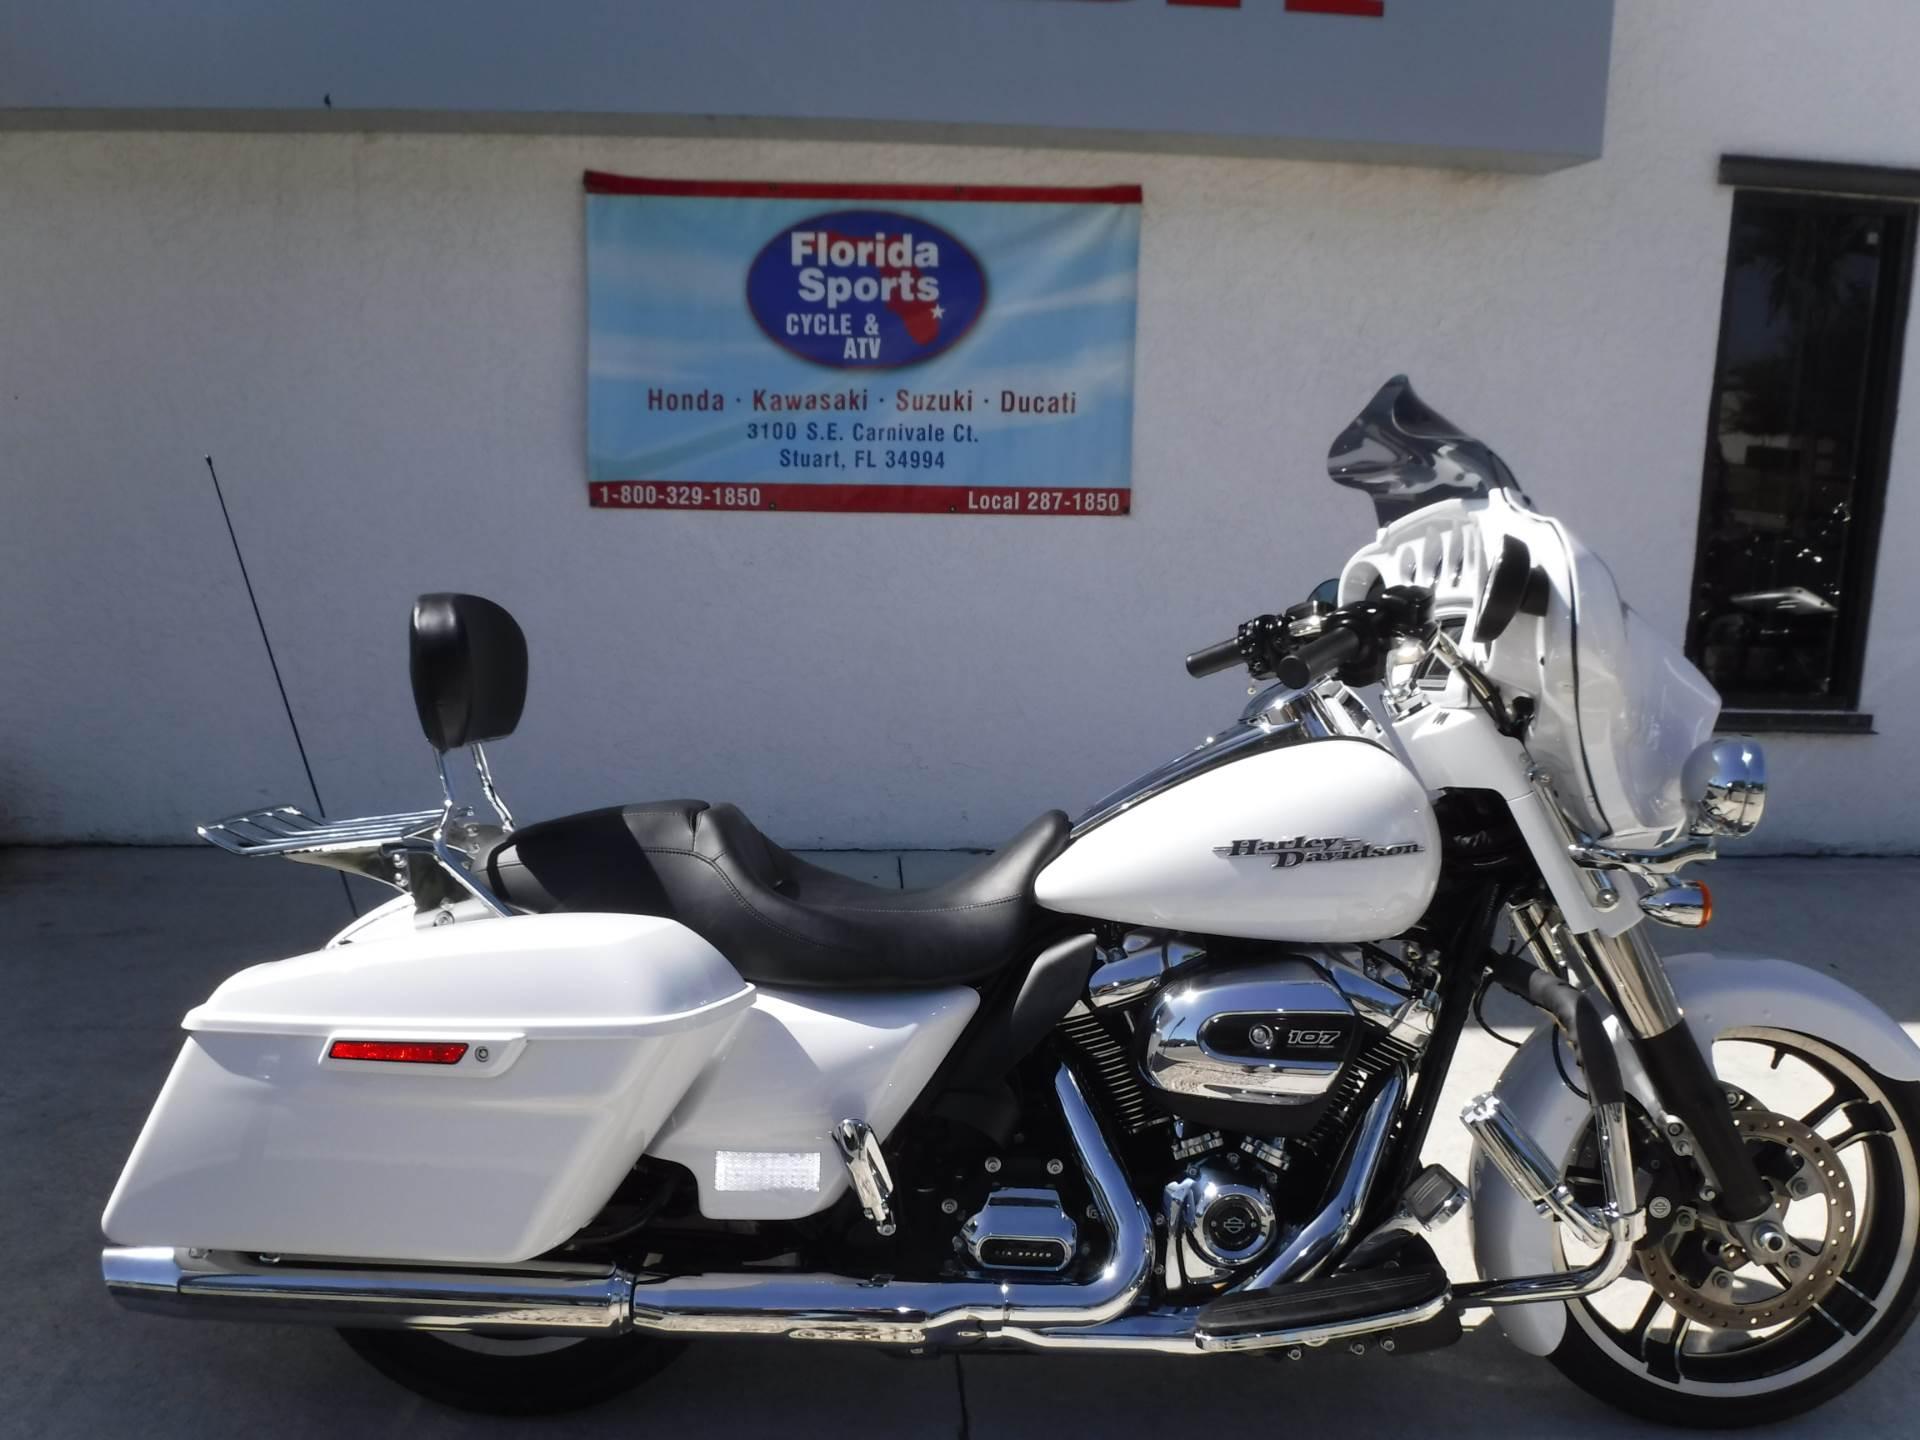 2017 Harley-Davidson Street Glide Special 1